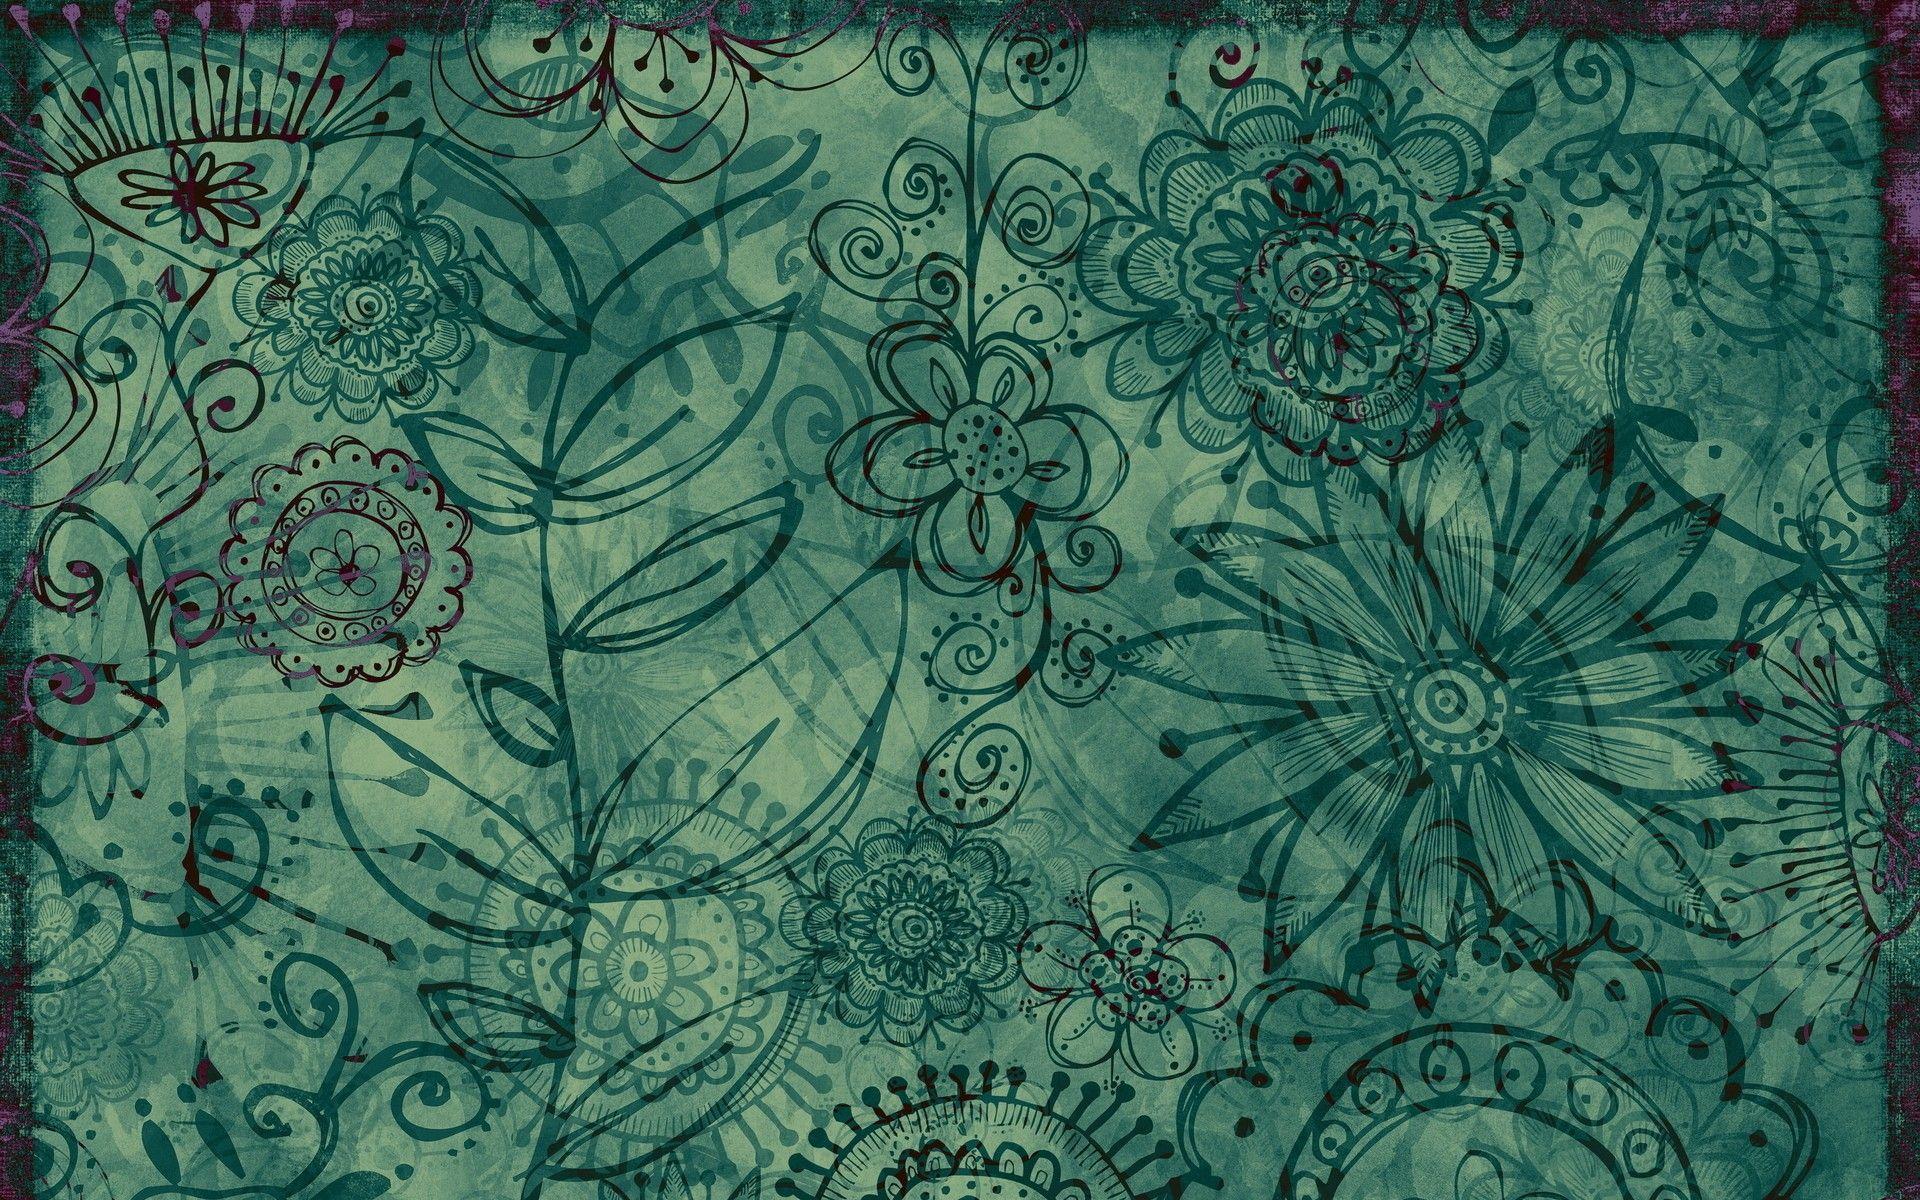 Hd Pattern Wallpapers Top Free Hd Pattern Backgrounds Wallpaperaccess